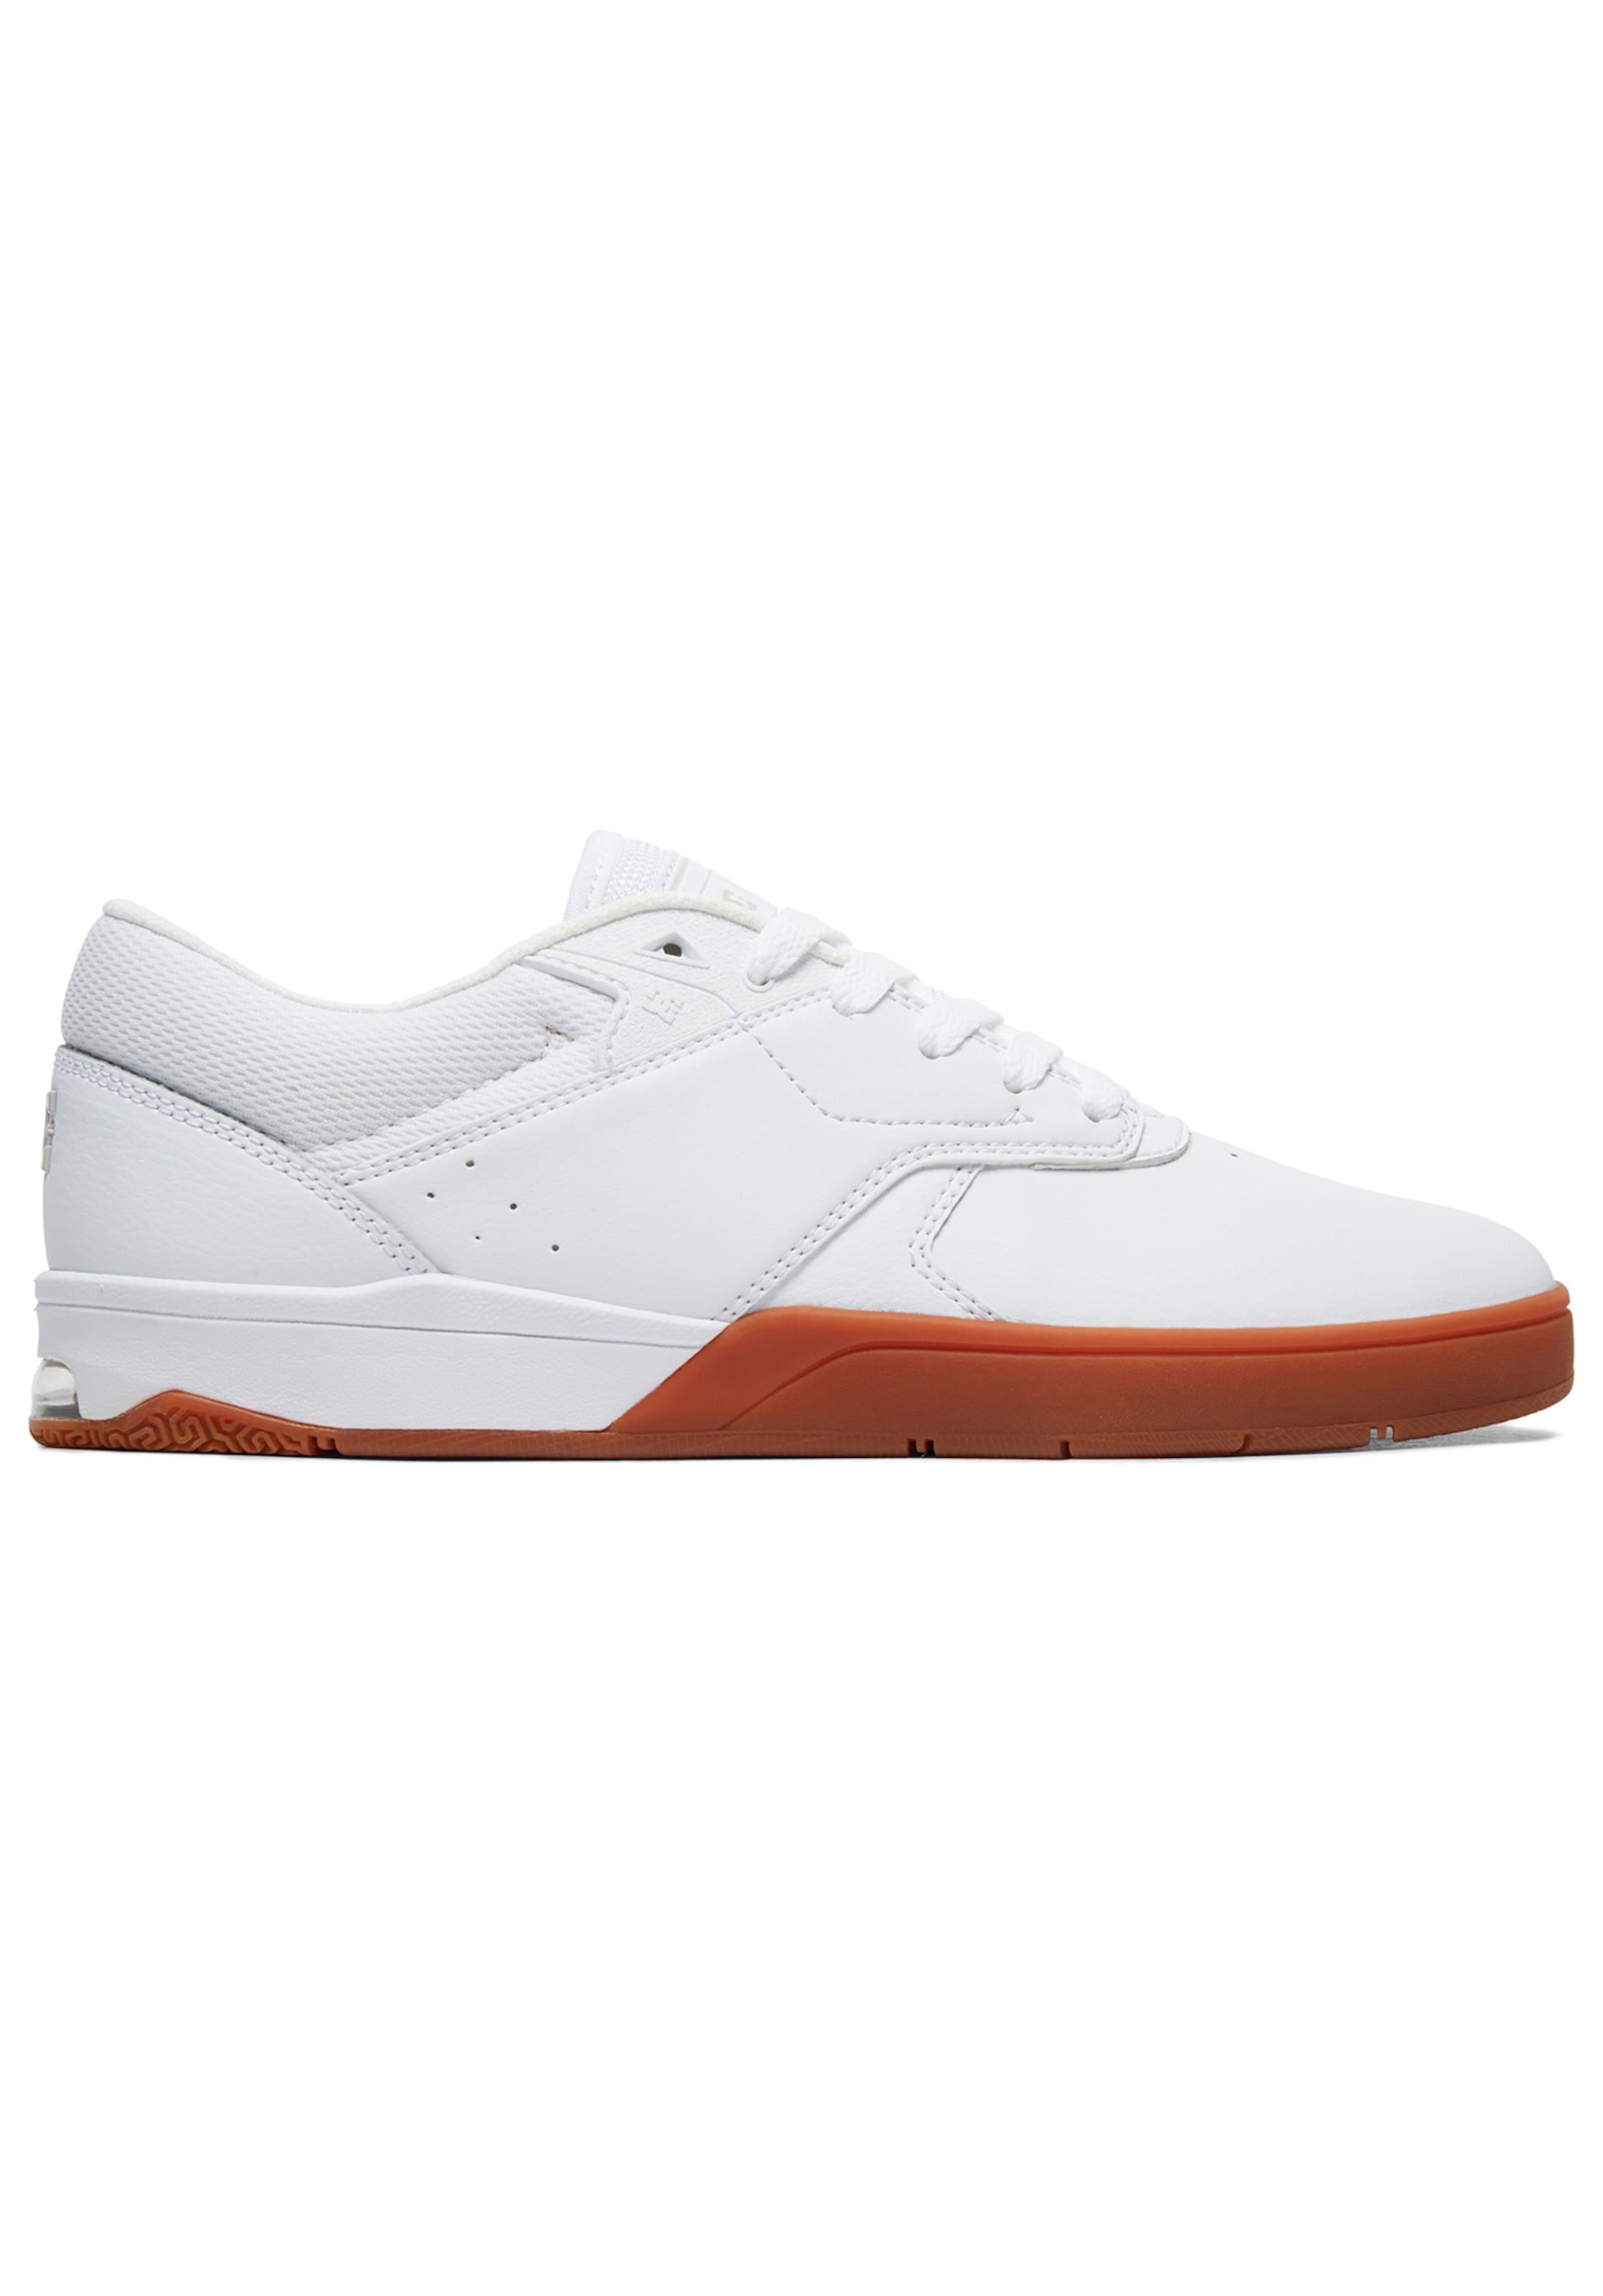 Sneaker S' 'tiago RotWeiß Shoes Dc In 7gybf6Y